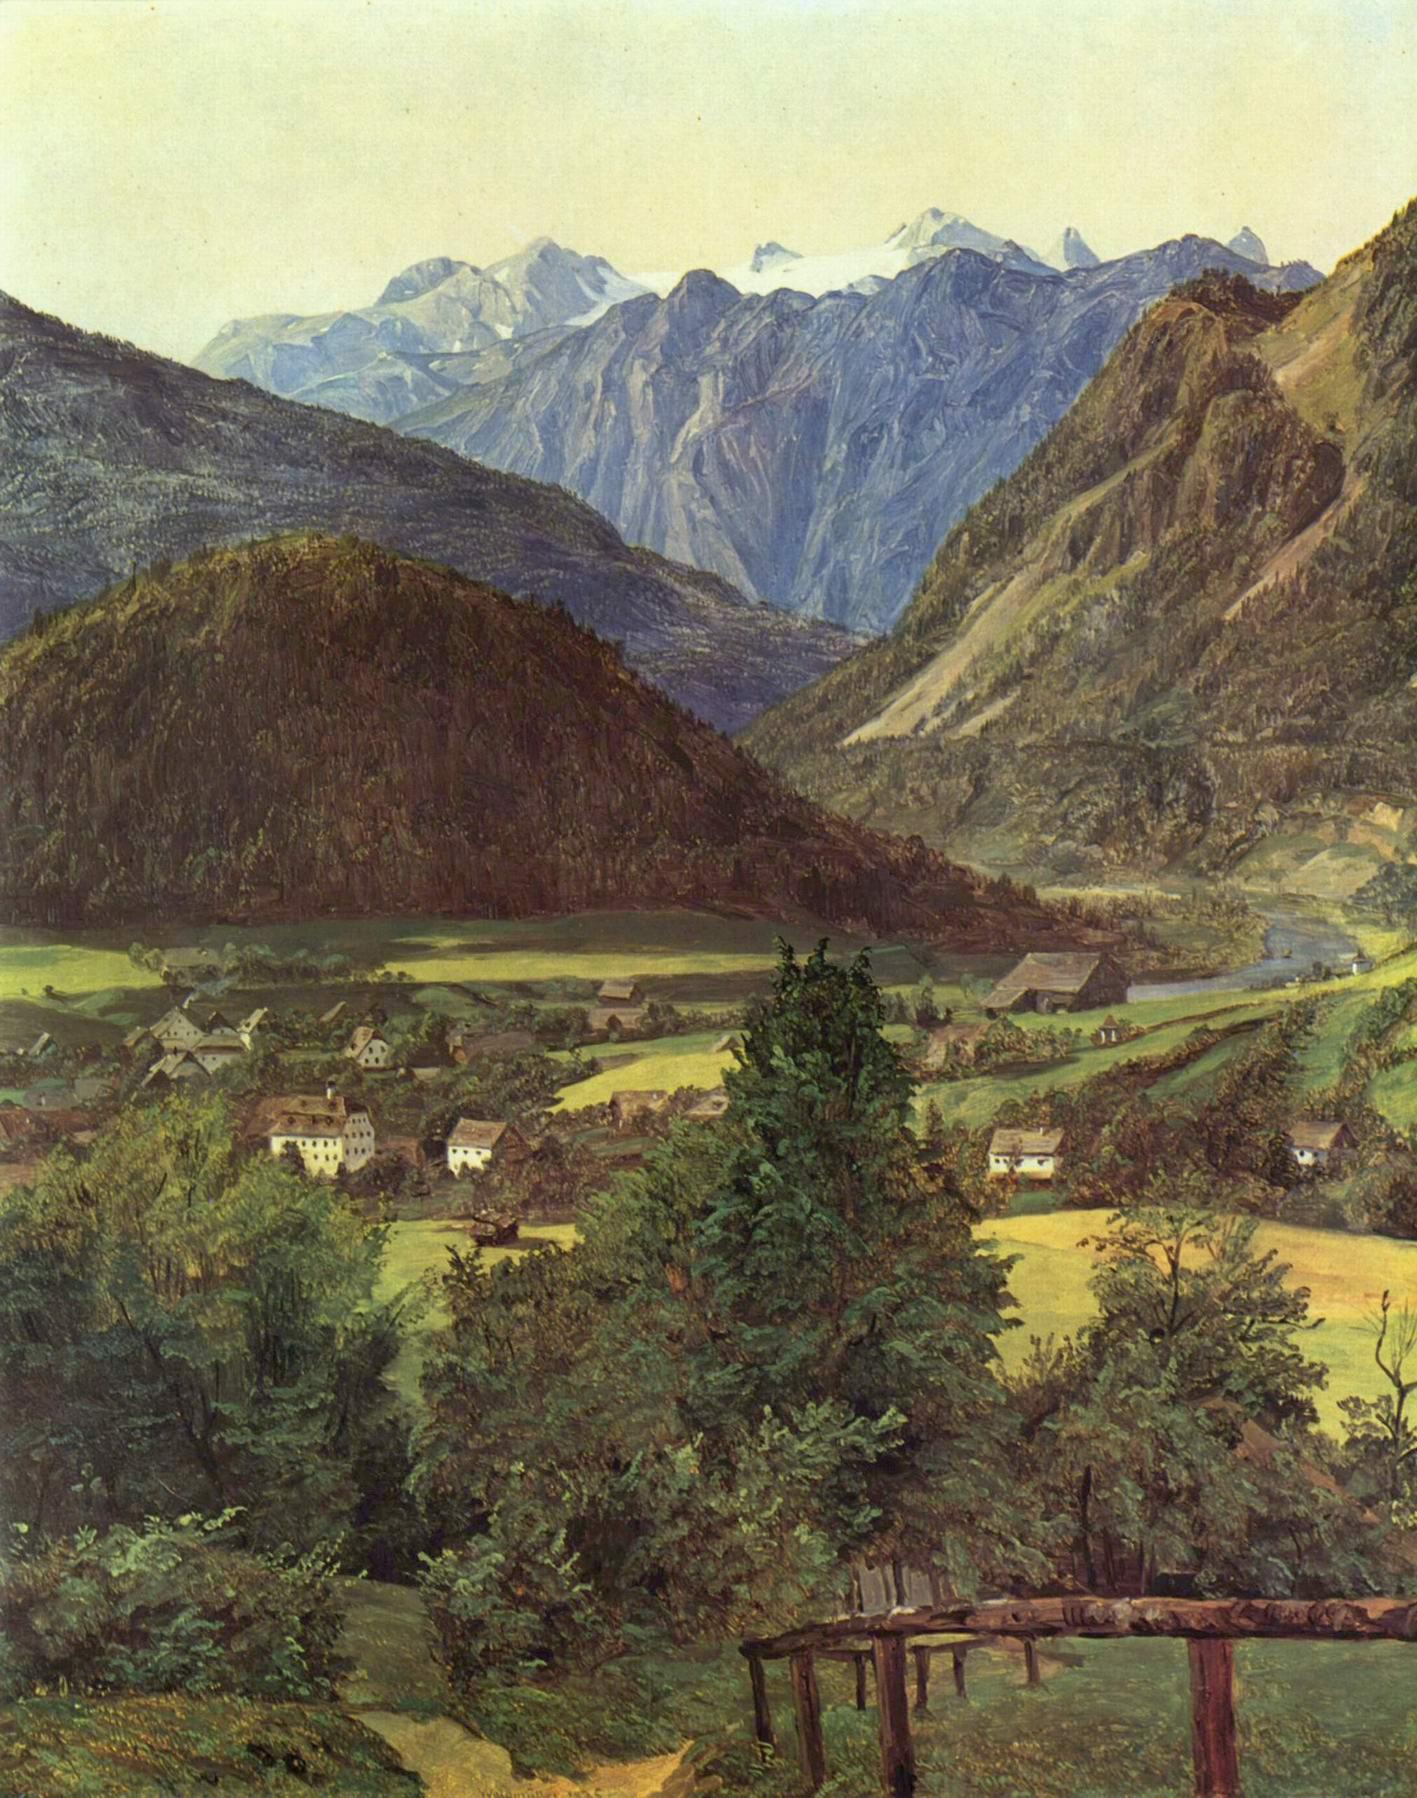 Вид на Дахштайн с Зофиенплатц, Вальдмюллер Фердинанд Георг